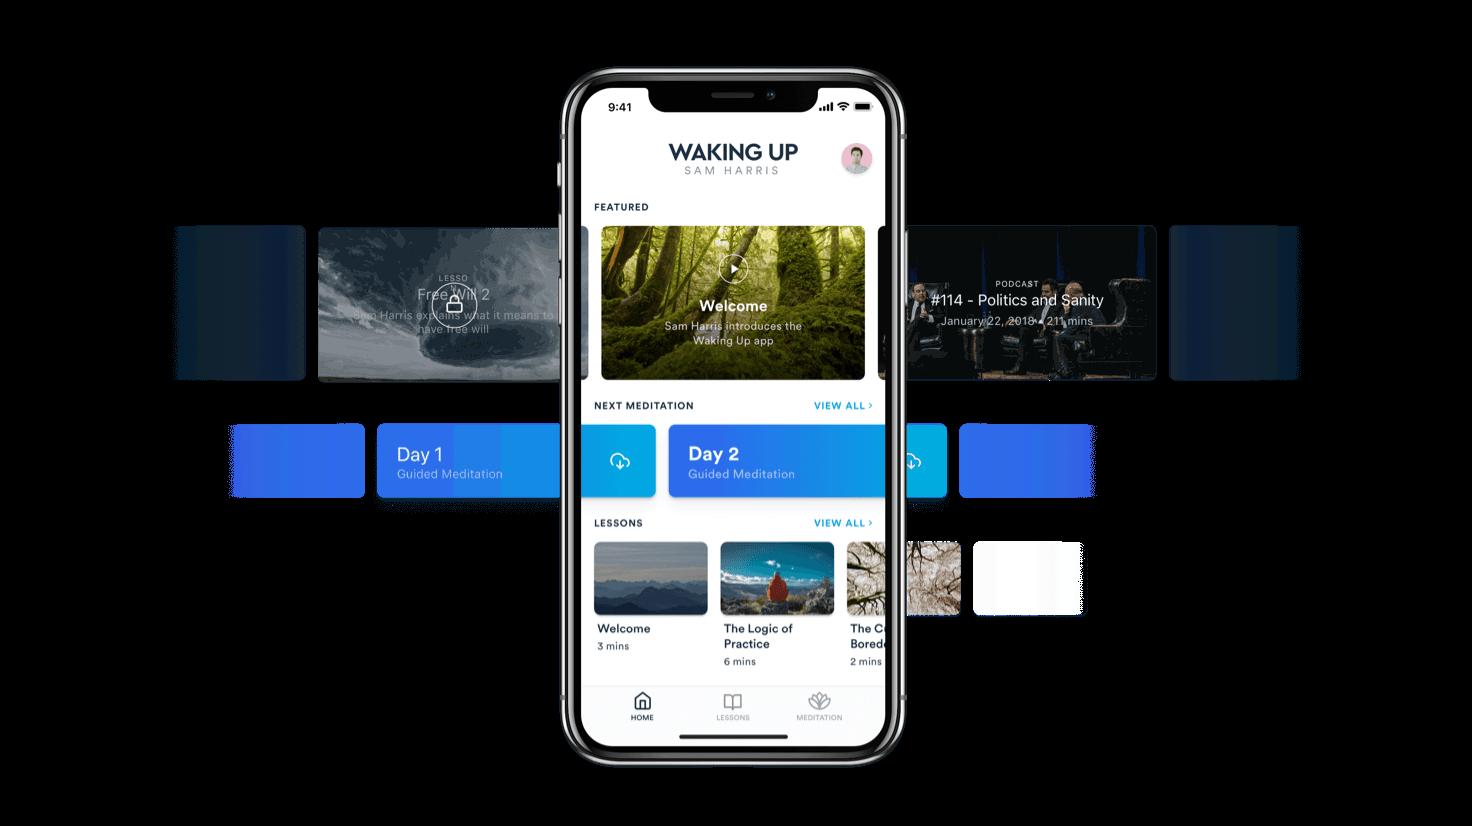 Waking up app homepage